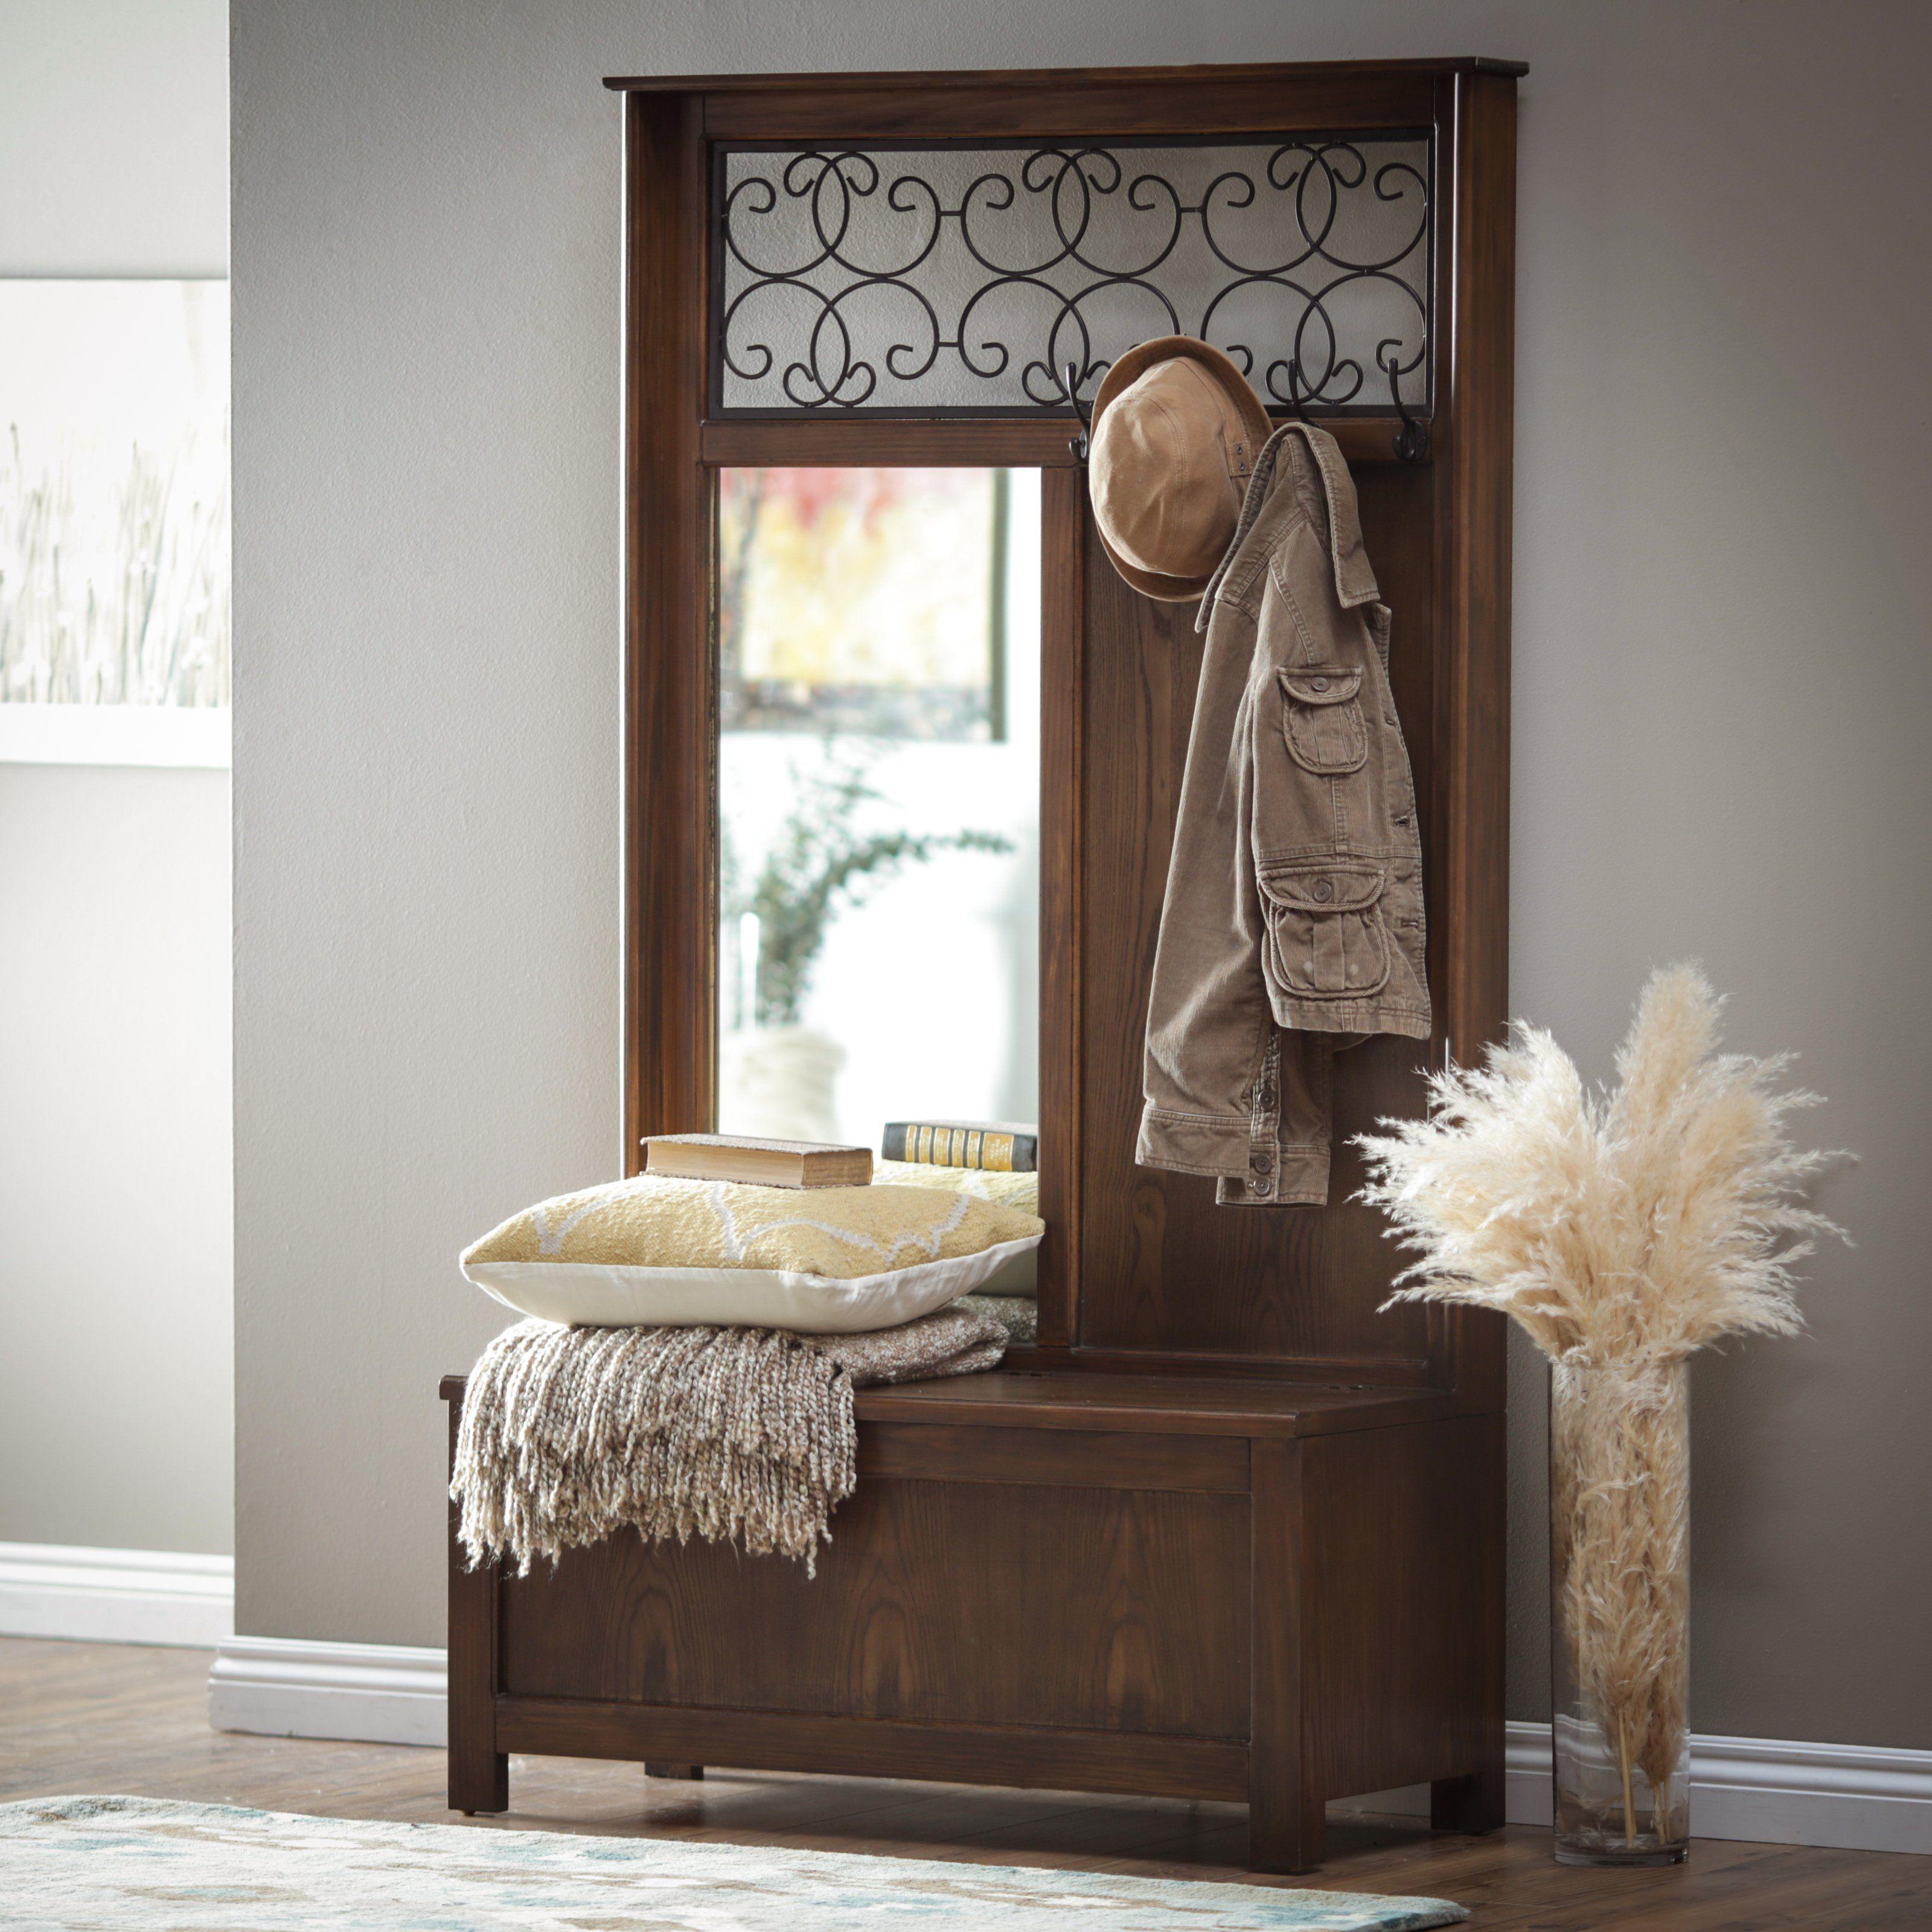 Elegant Foyer Furniture: Elegant Hall Tree Offers Compact